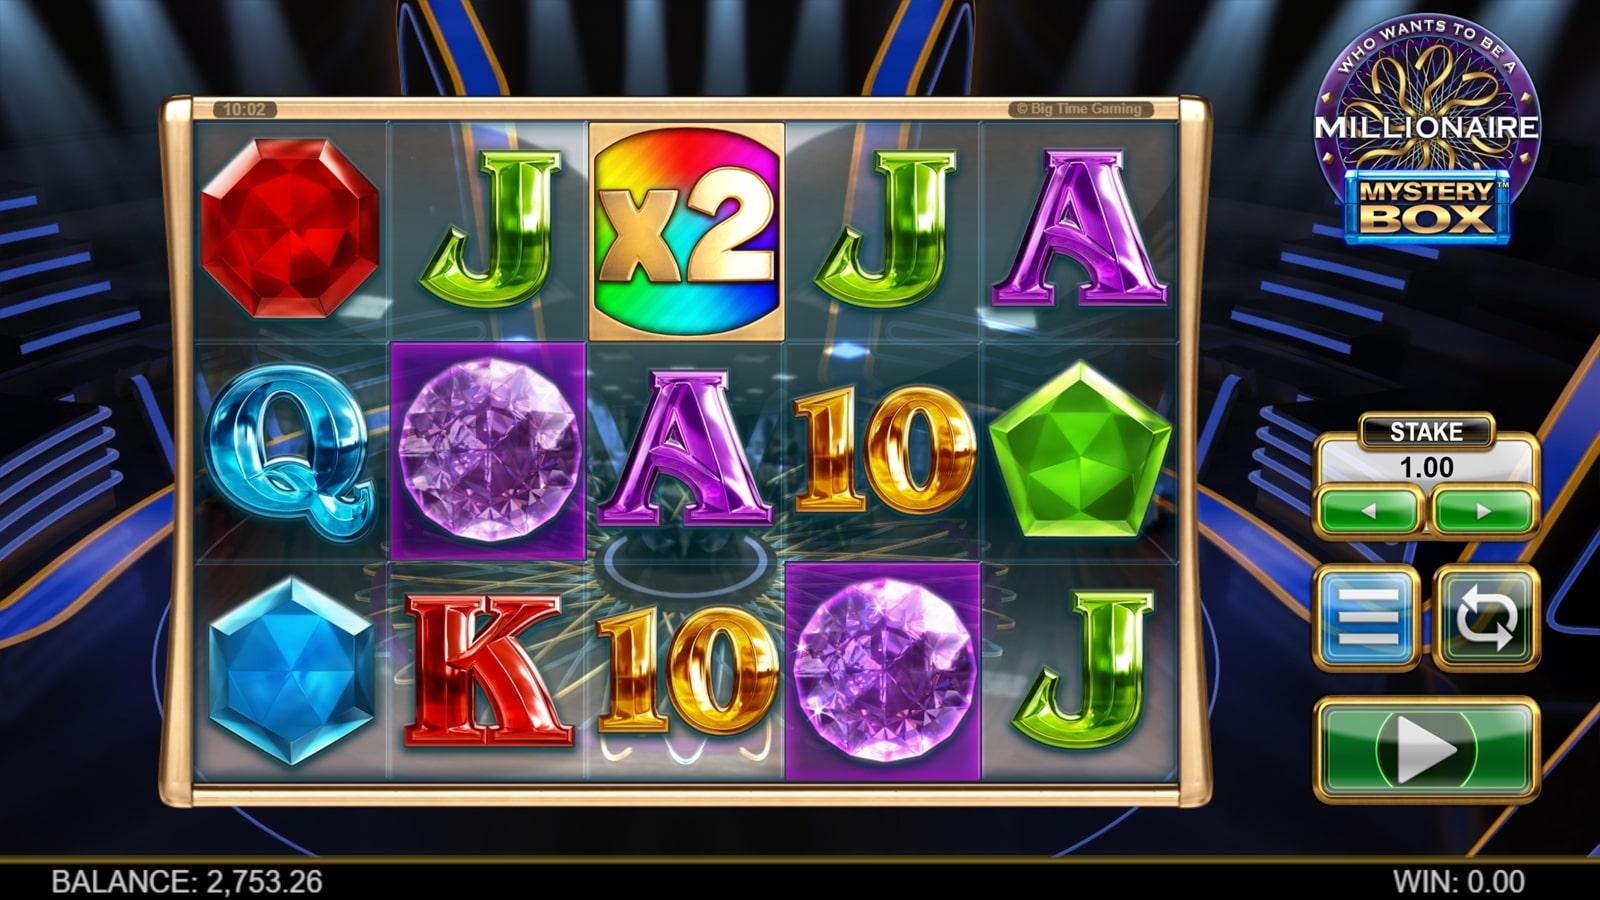 Millionaire Mystery Box Screenshot